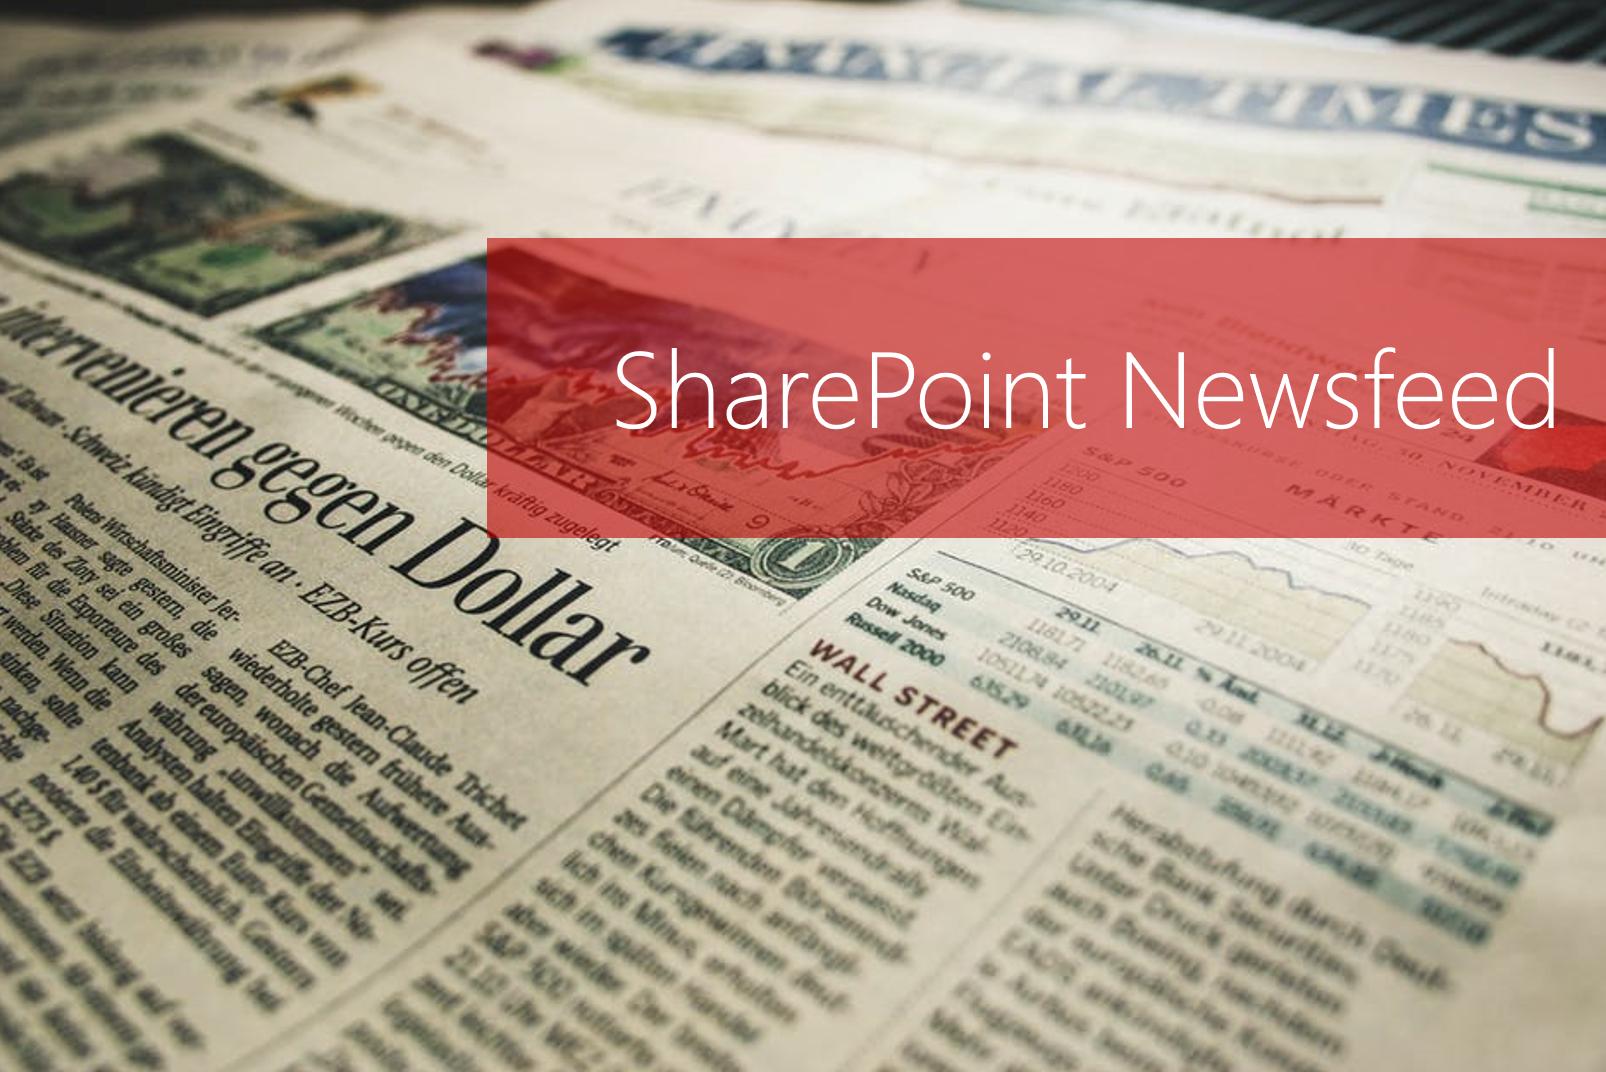 Microsoft 365 Day 19: SharePoint Newsfeed 101 & Resources